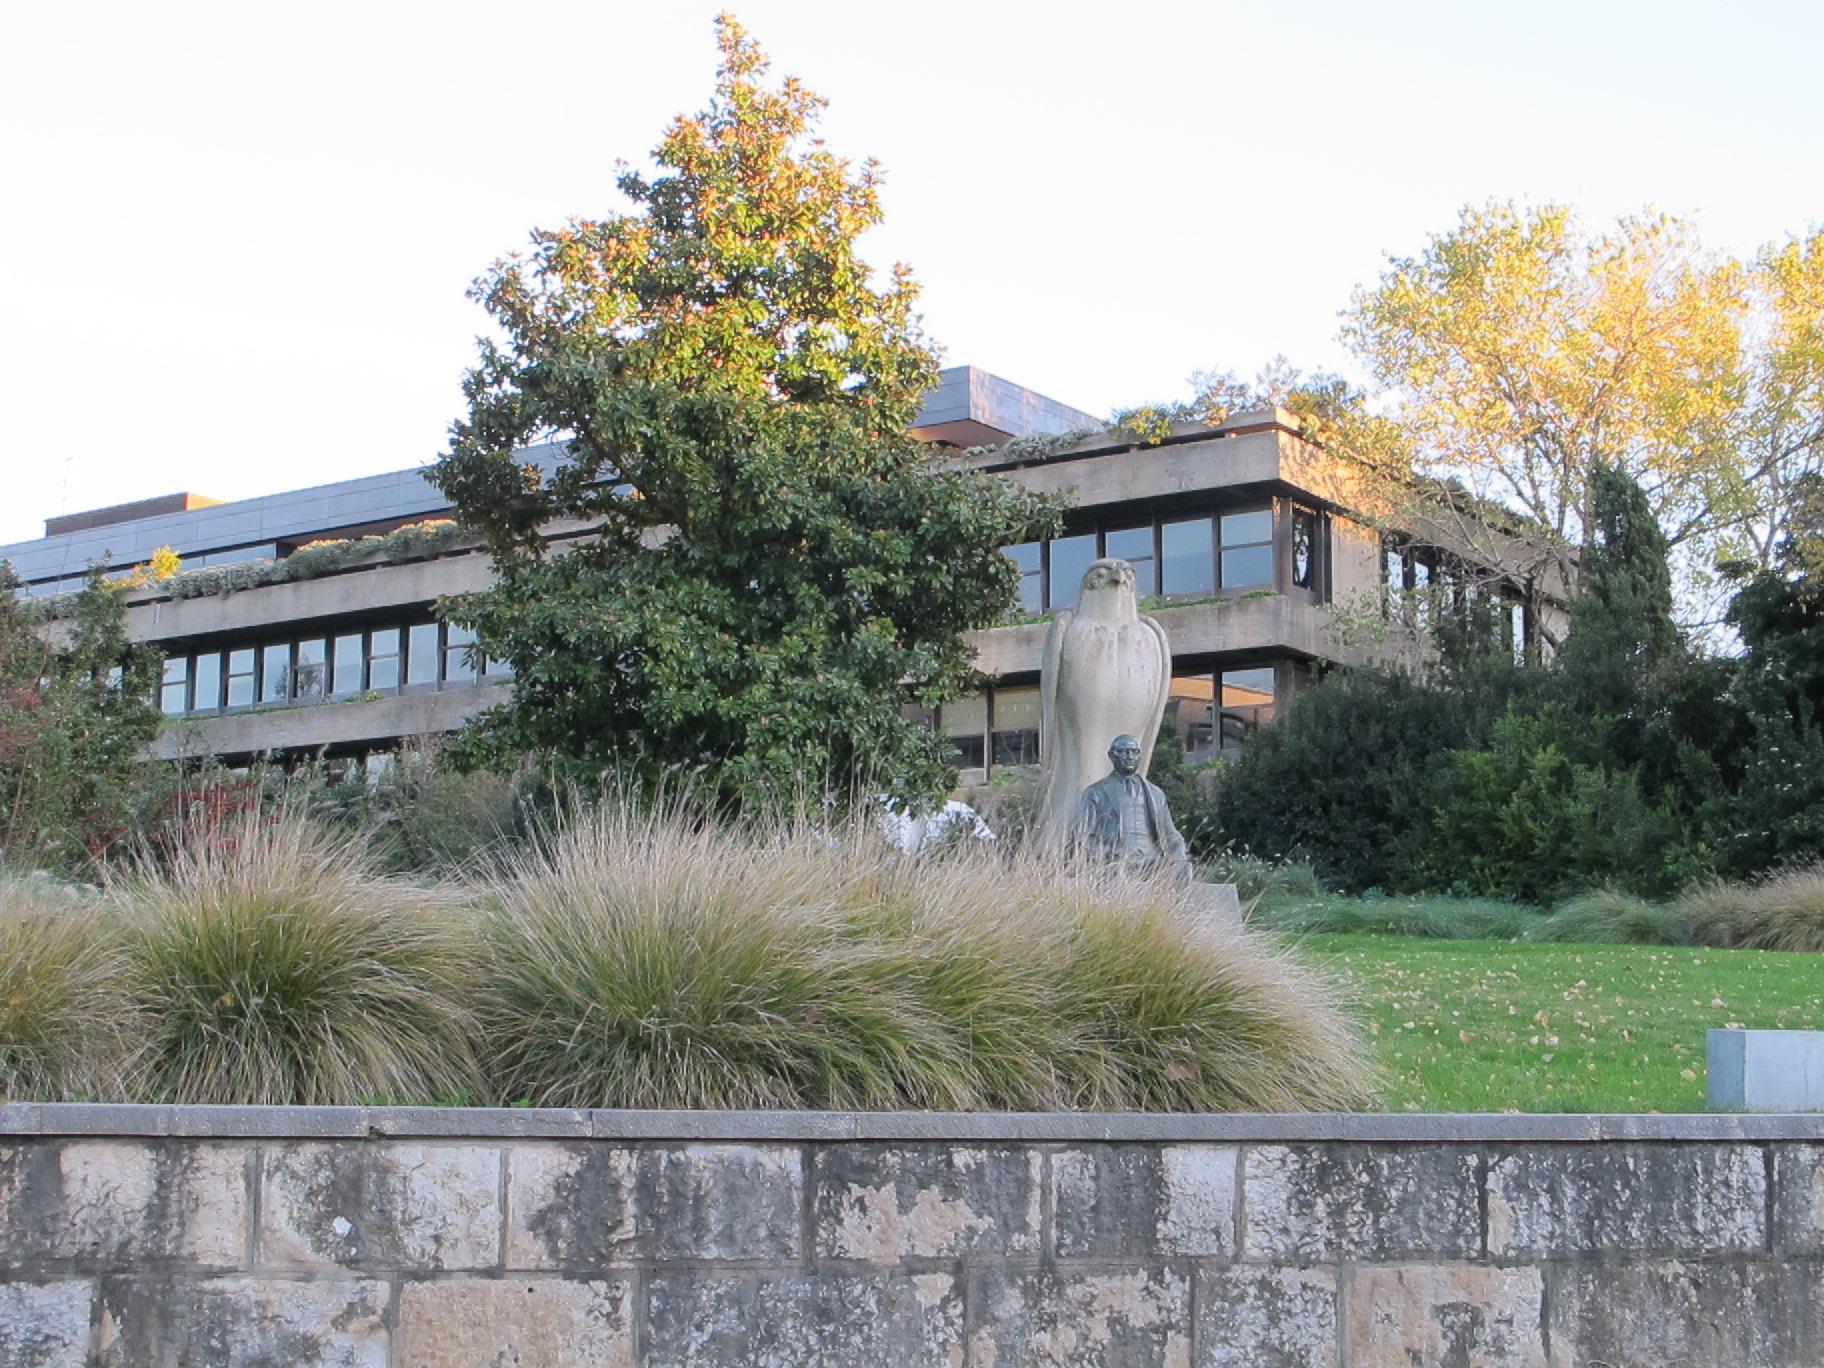 Gulbenkian Foundation, Lisbon (Nov. 2011)